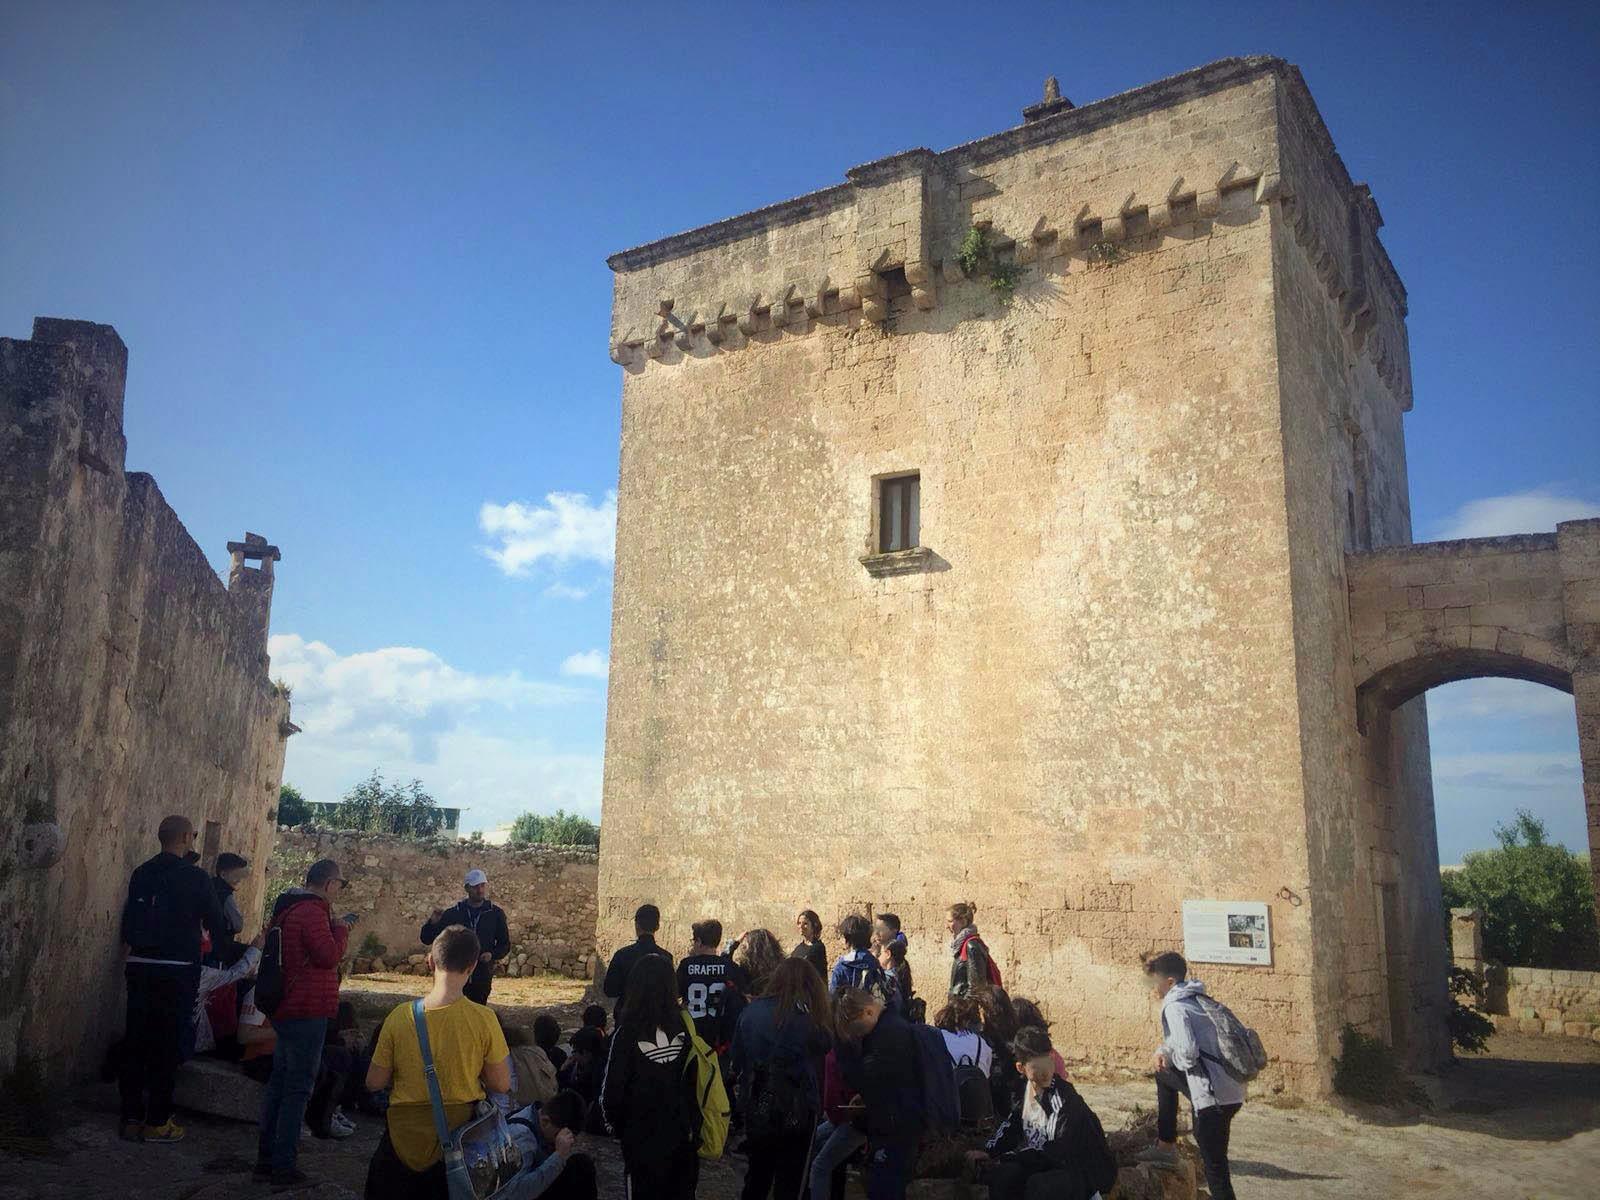 Torre Masseria Spina piccola